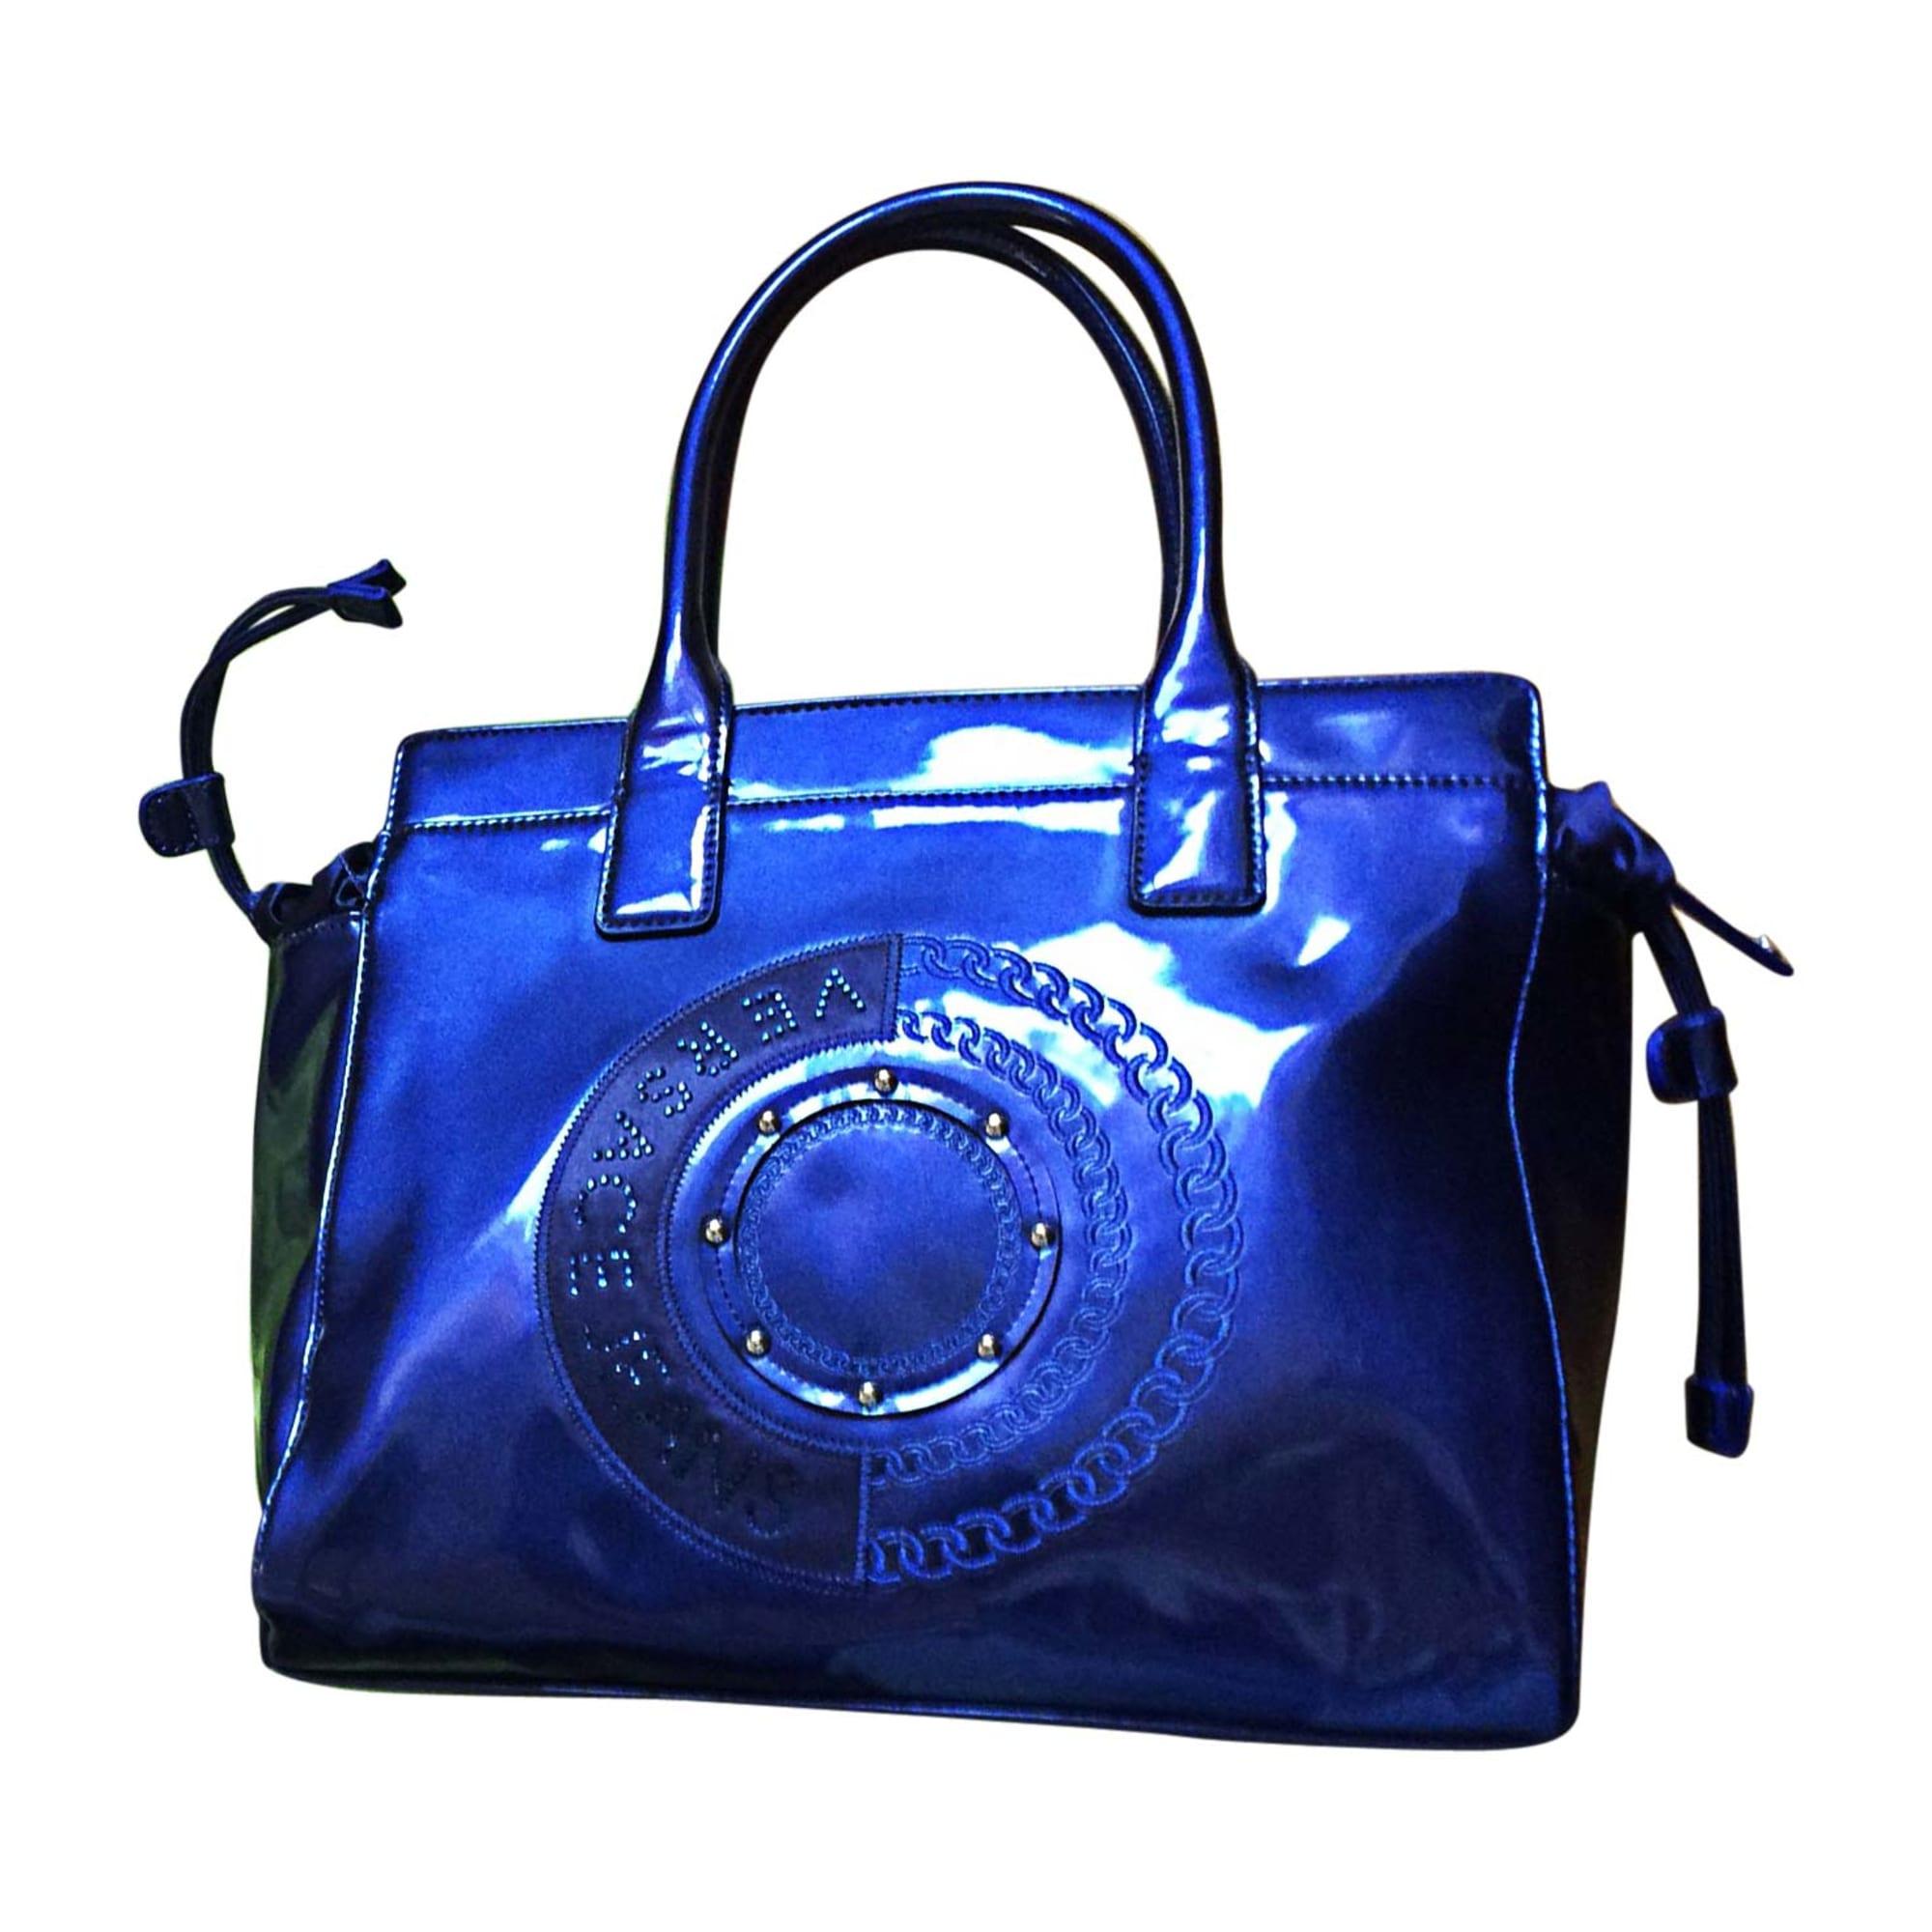 Sac à main en cuir VERSACE Bleu, bleu marine, bleu turquoise 489285aaf47